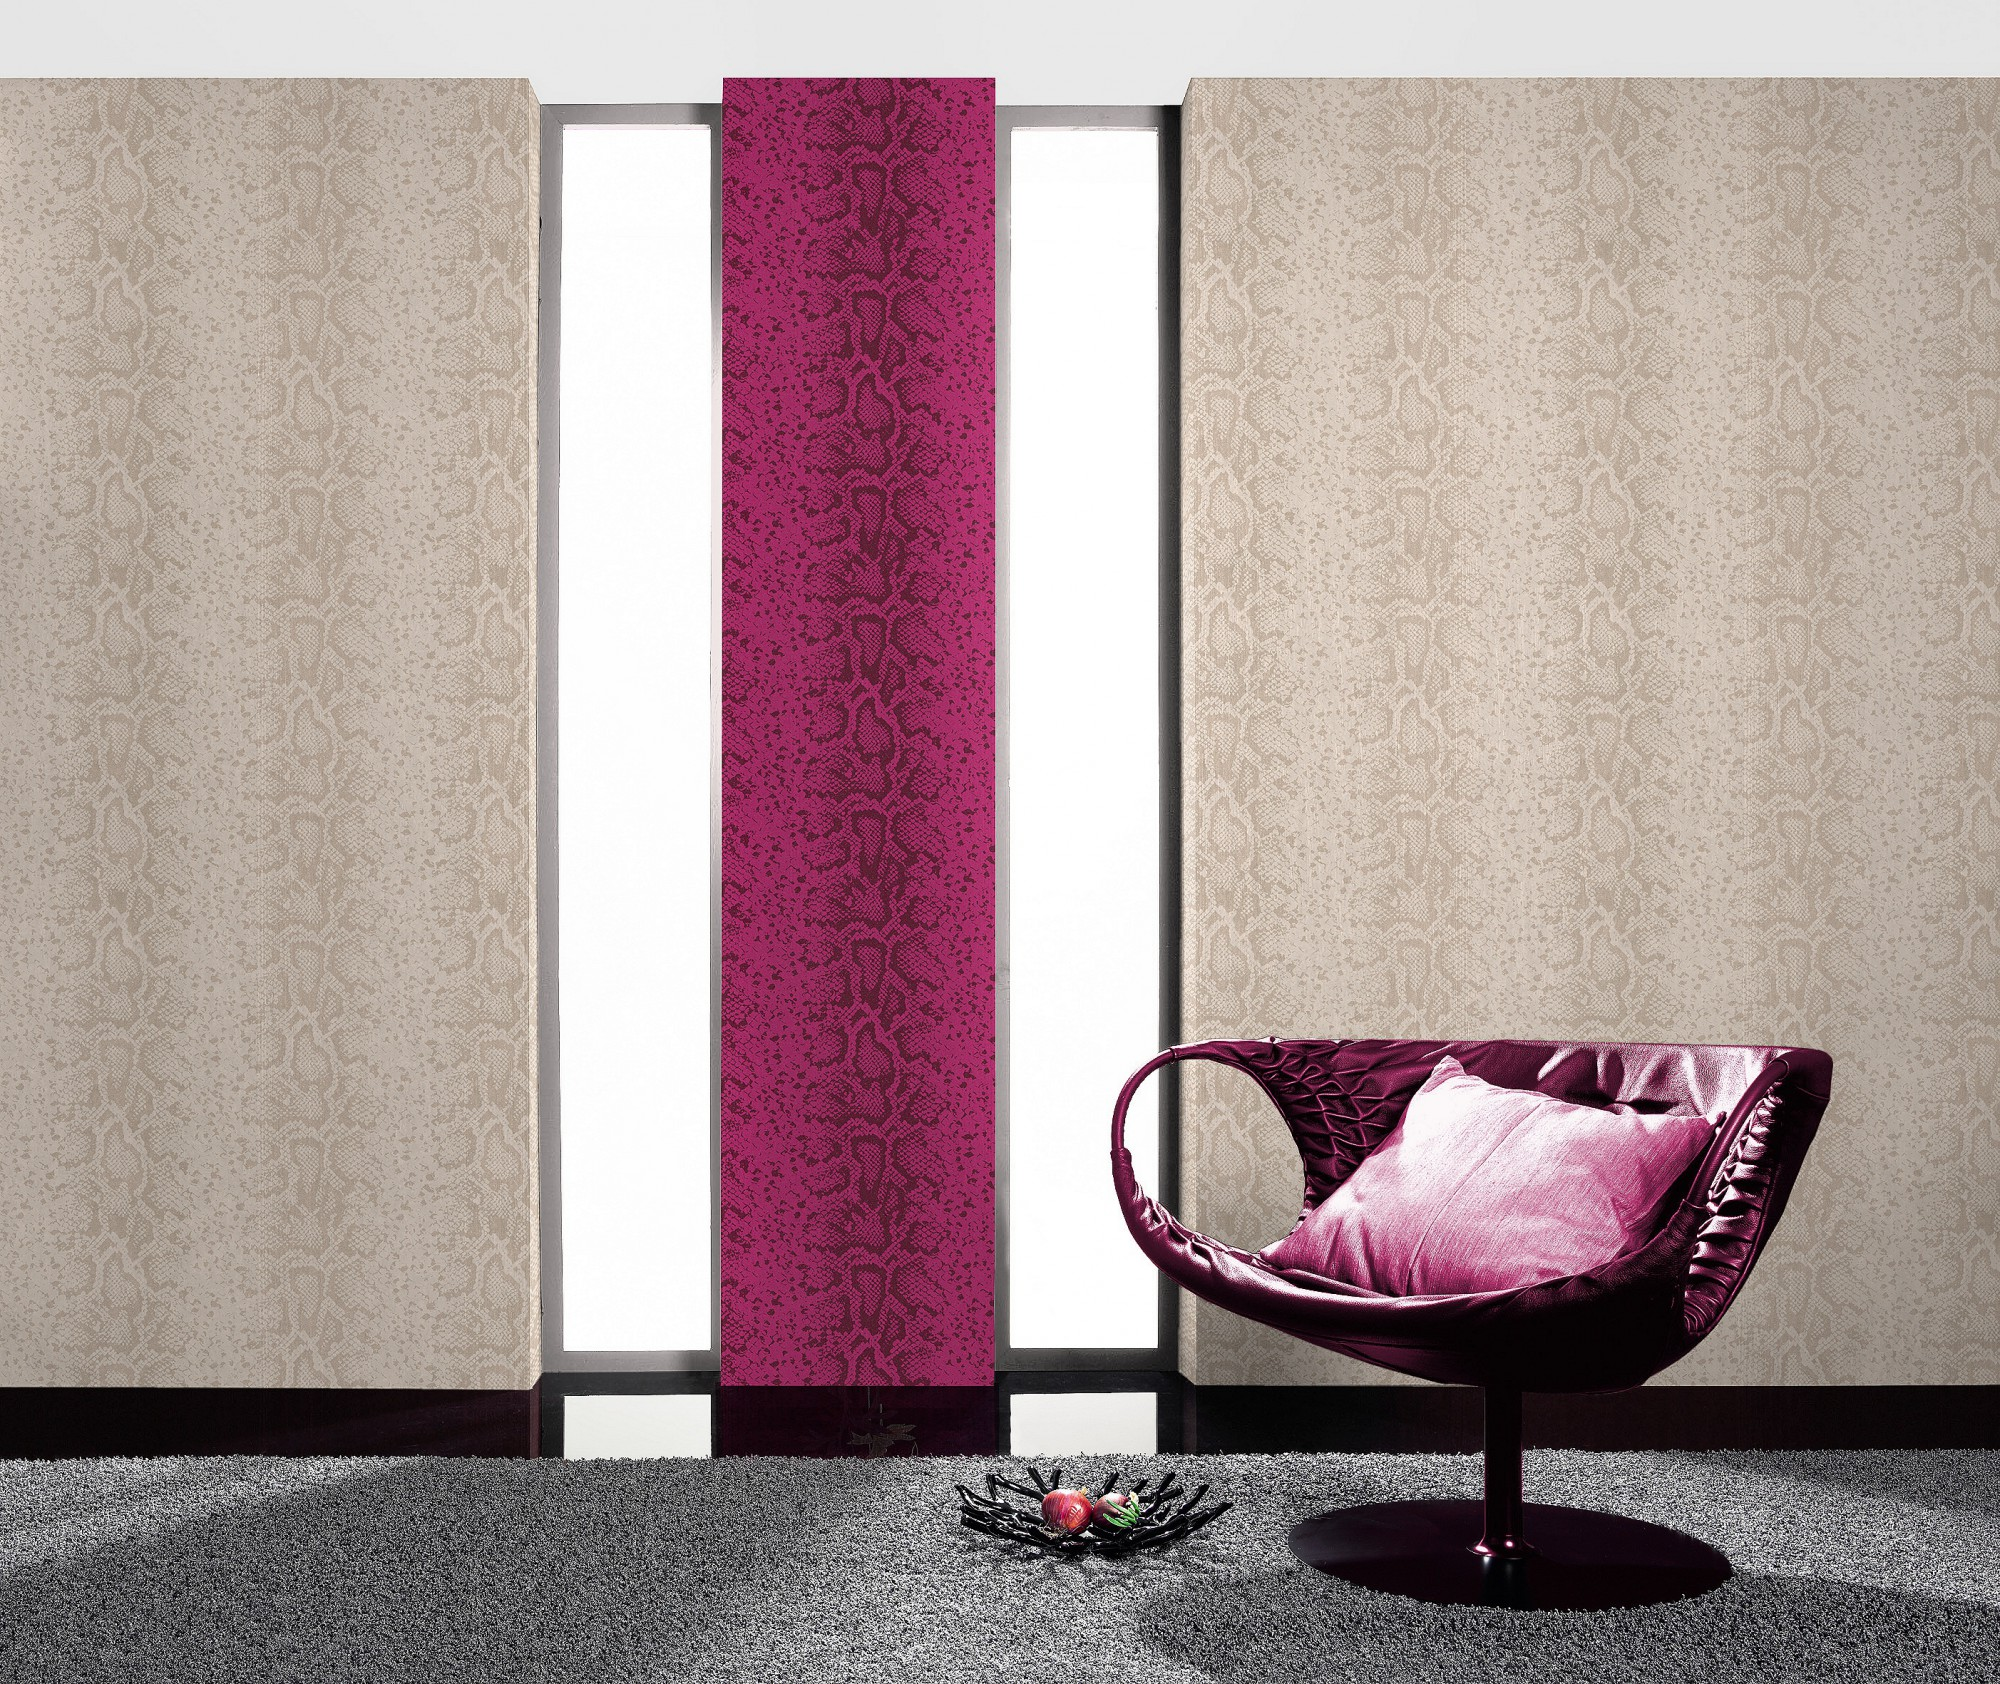 bestseller tapete rasch schlangenhaut optik tapete 281019 creme beige glitzer. Black Bedroom Furniture Sets. Home Design Ideas